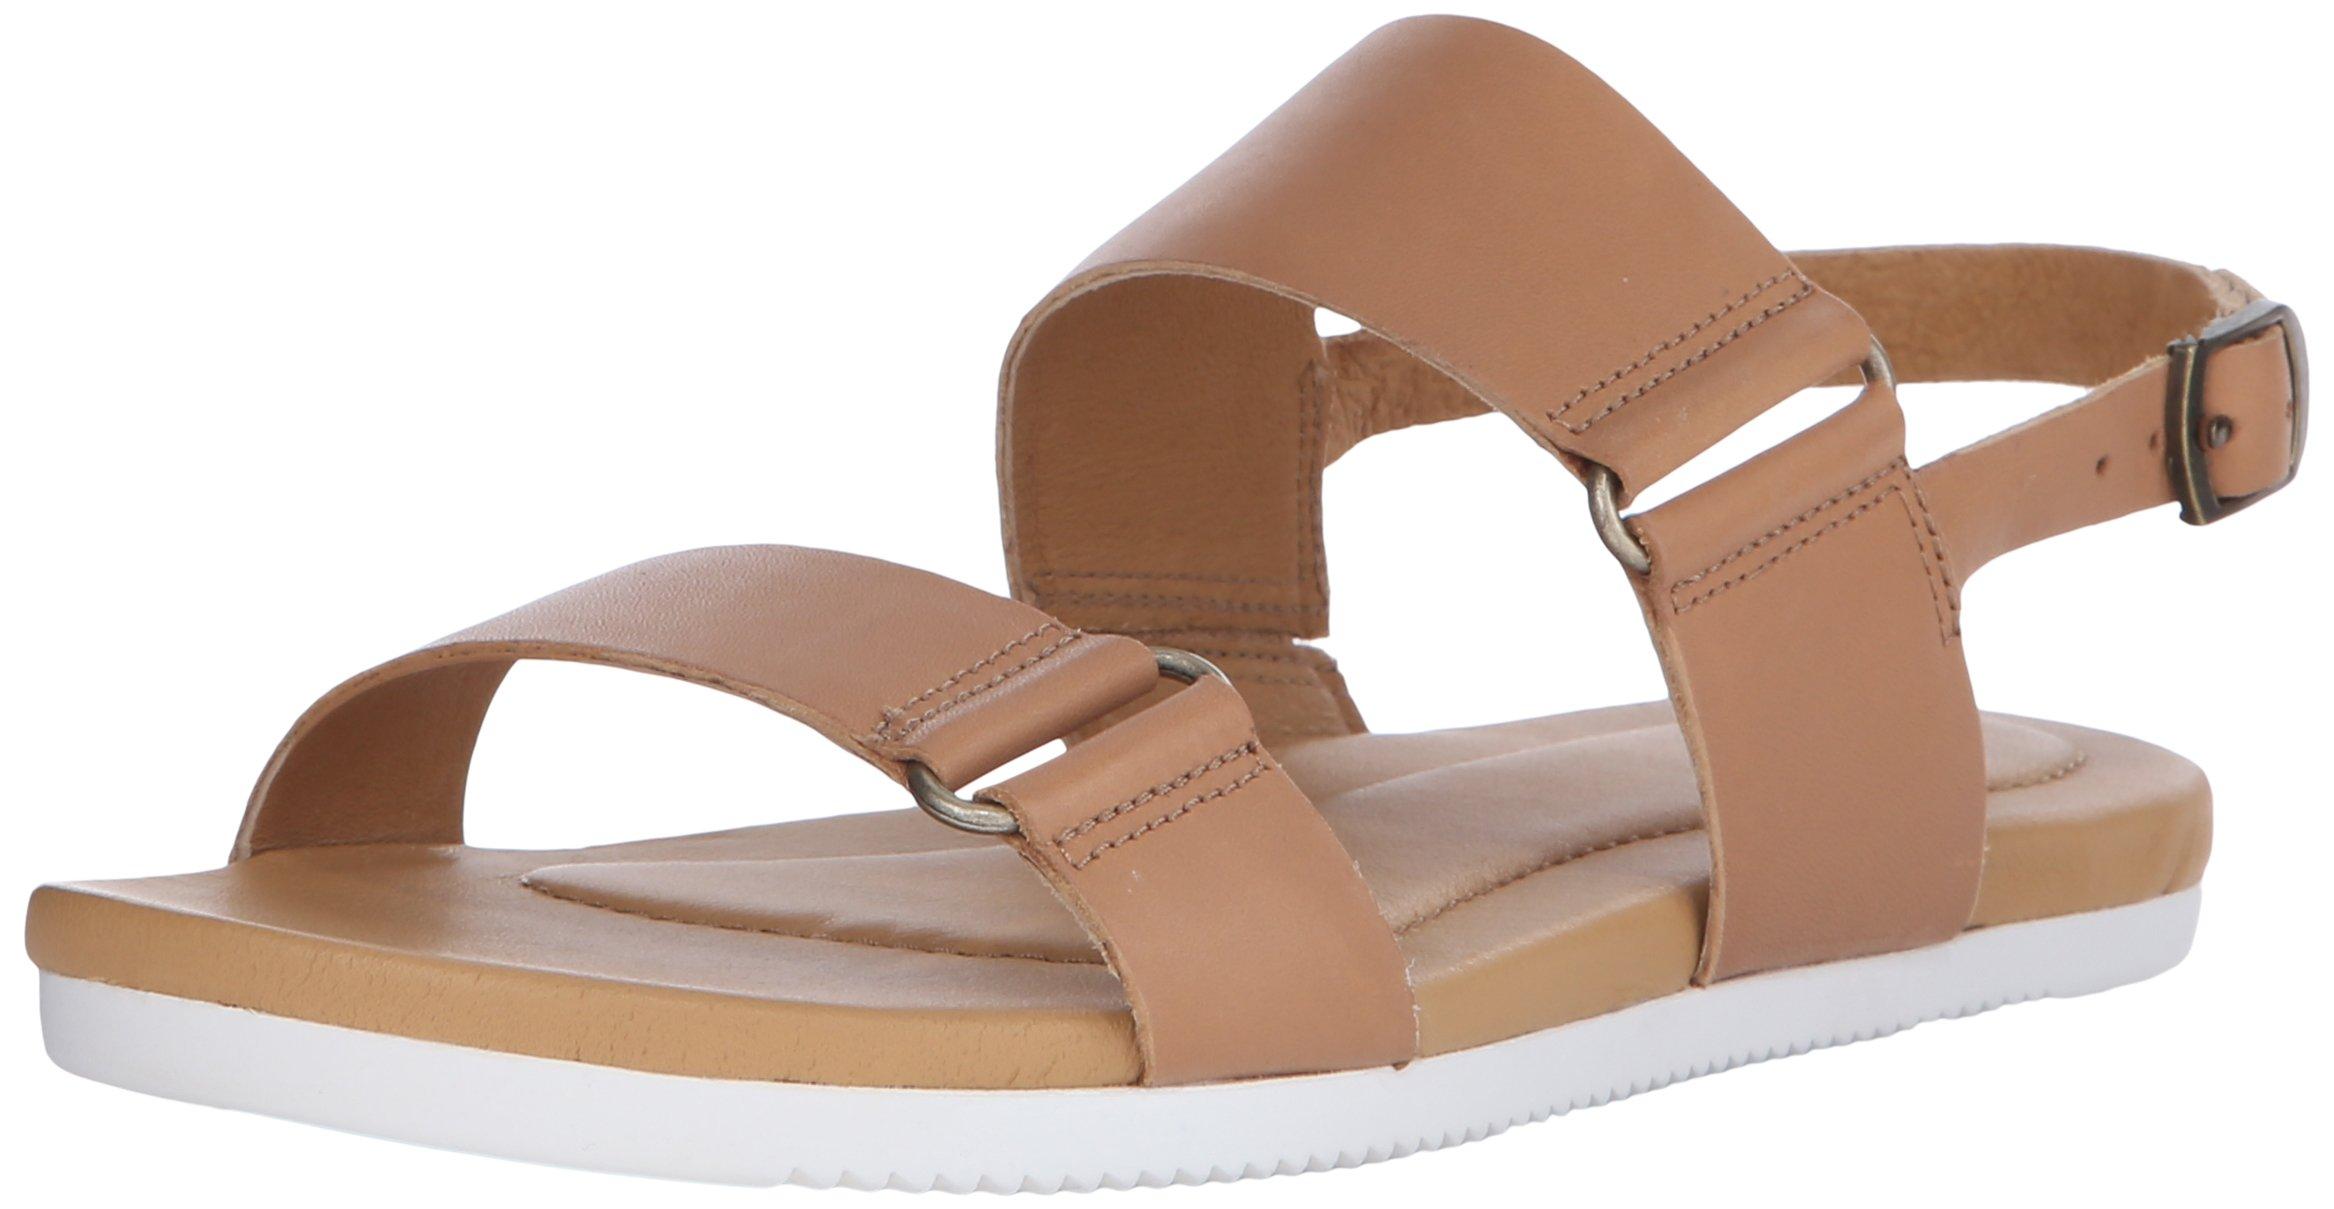 Uk Avalina Brown Size5 Teva Women's Sandals O8nwPk0